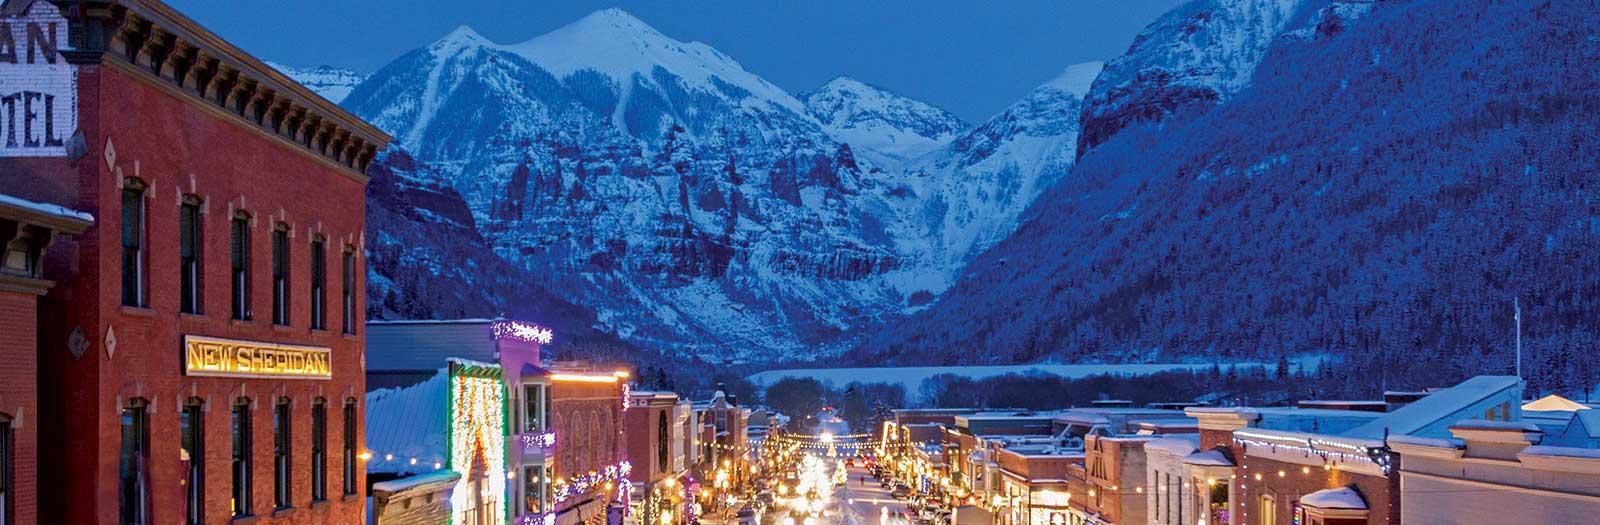 colorado ski resorts, colorado ski vacation, colorado ski packages, colorado ski resort map, ski map of Colorado, colorado vacation packages, where to ski in Colorado